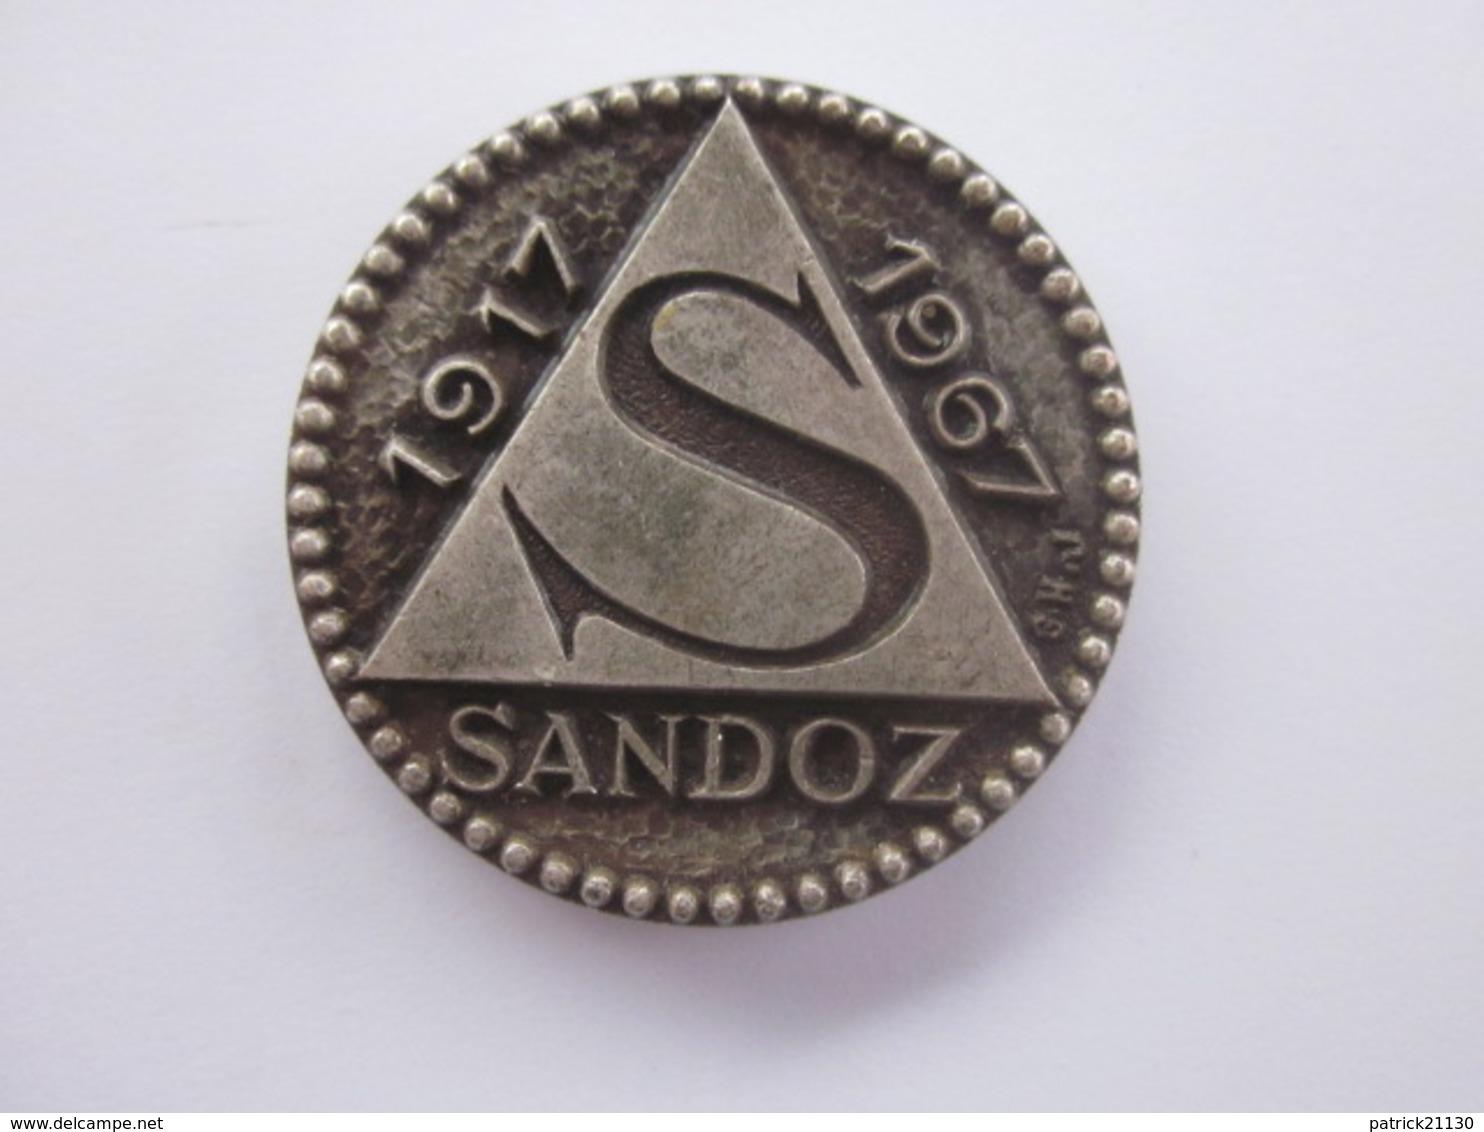 MEDAILLE LABORATOIRES SANDOZ 1917 1967 MEDECINE OU PHARMACIE - Firma's